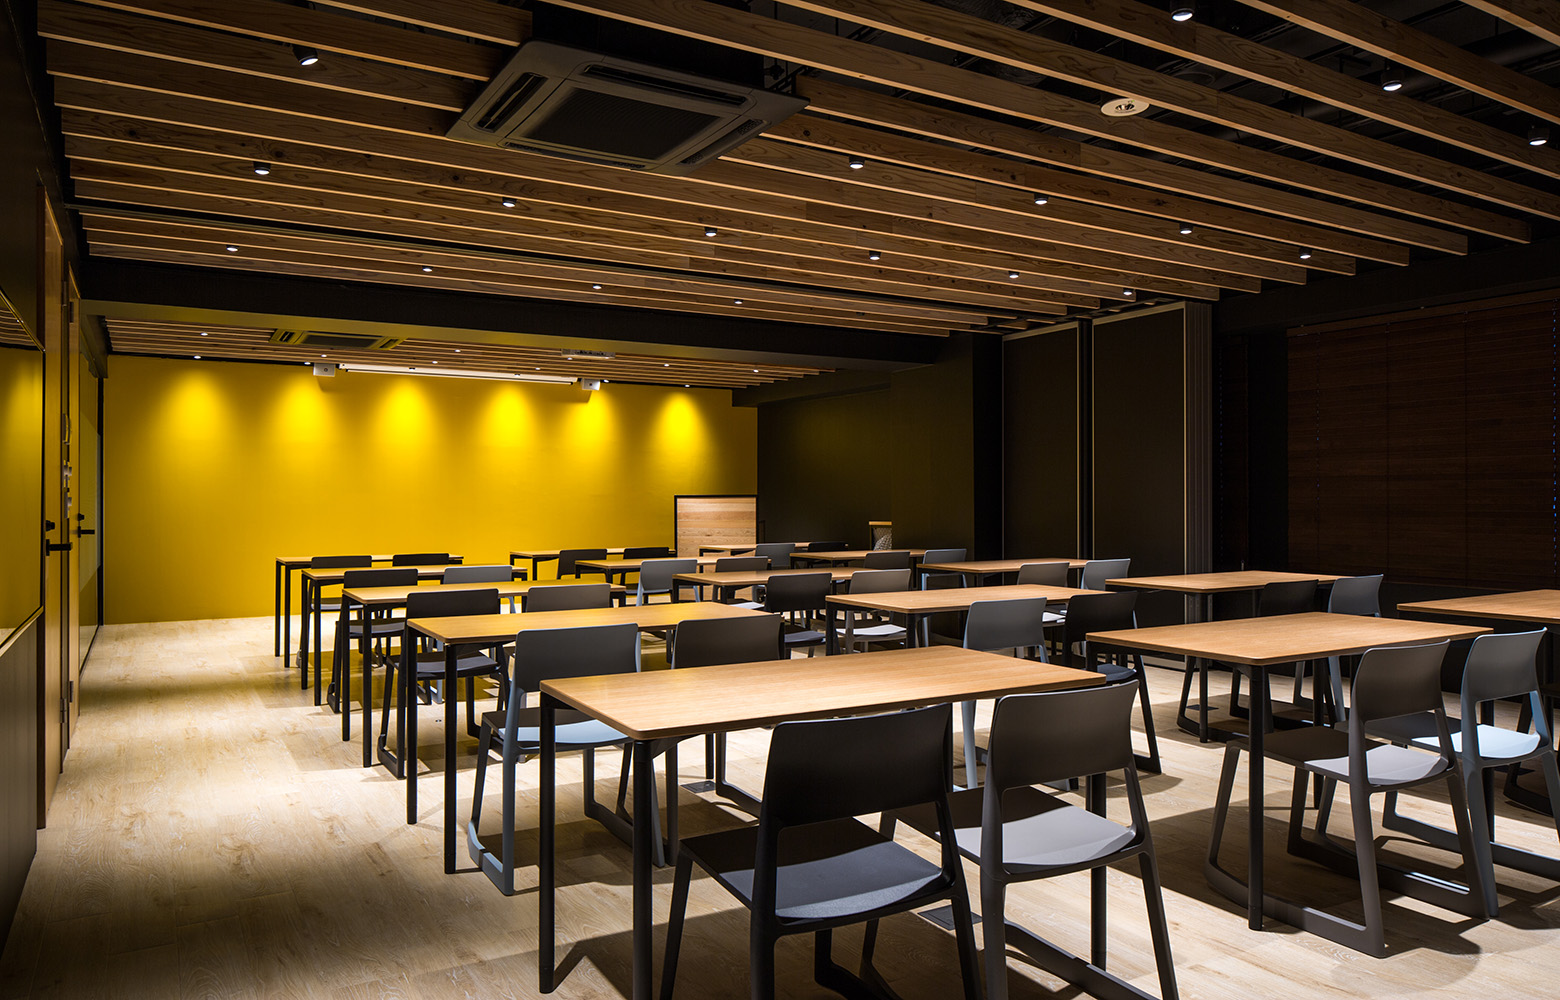 Secret Office Theater Room デザイン・レイアウト事例